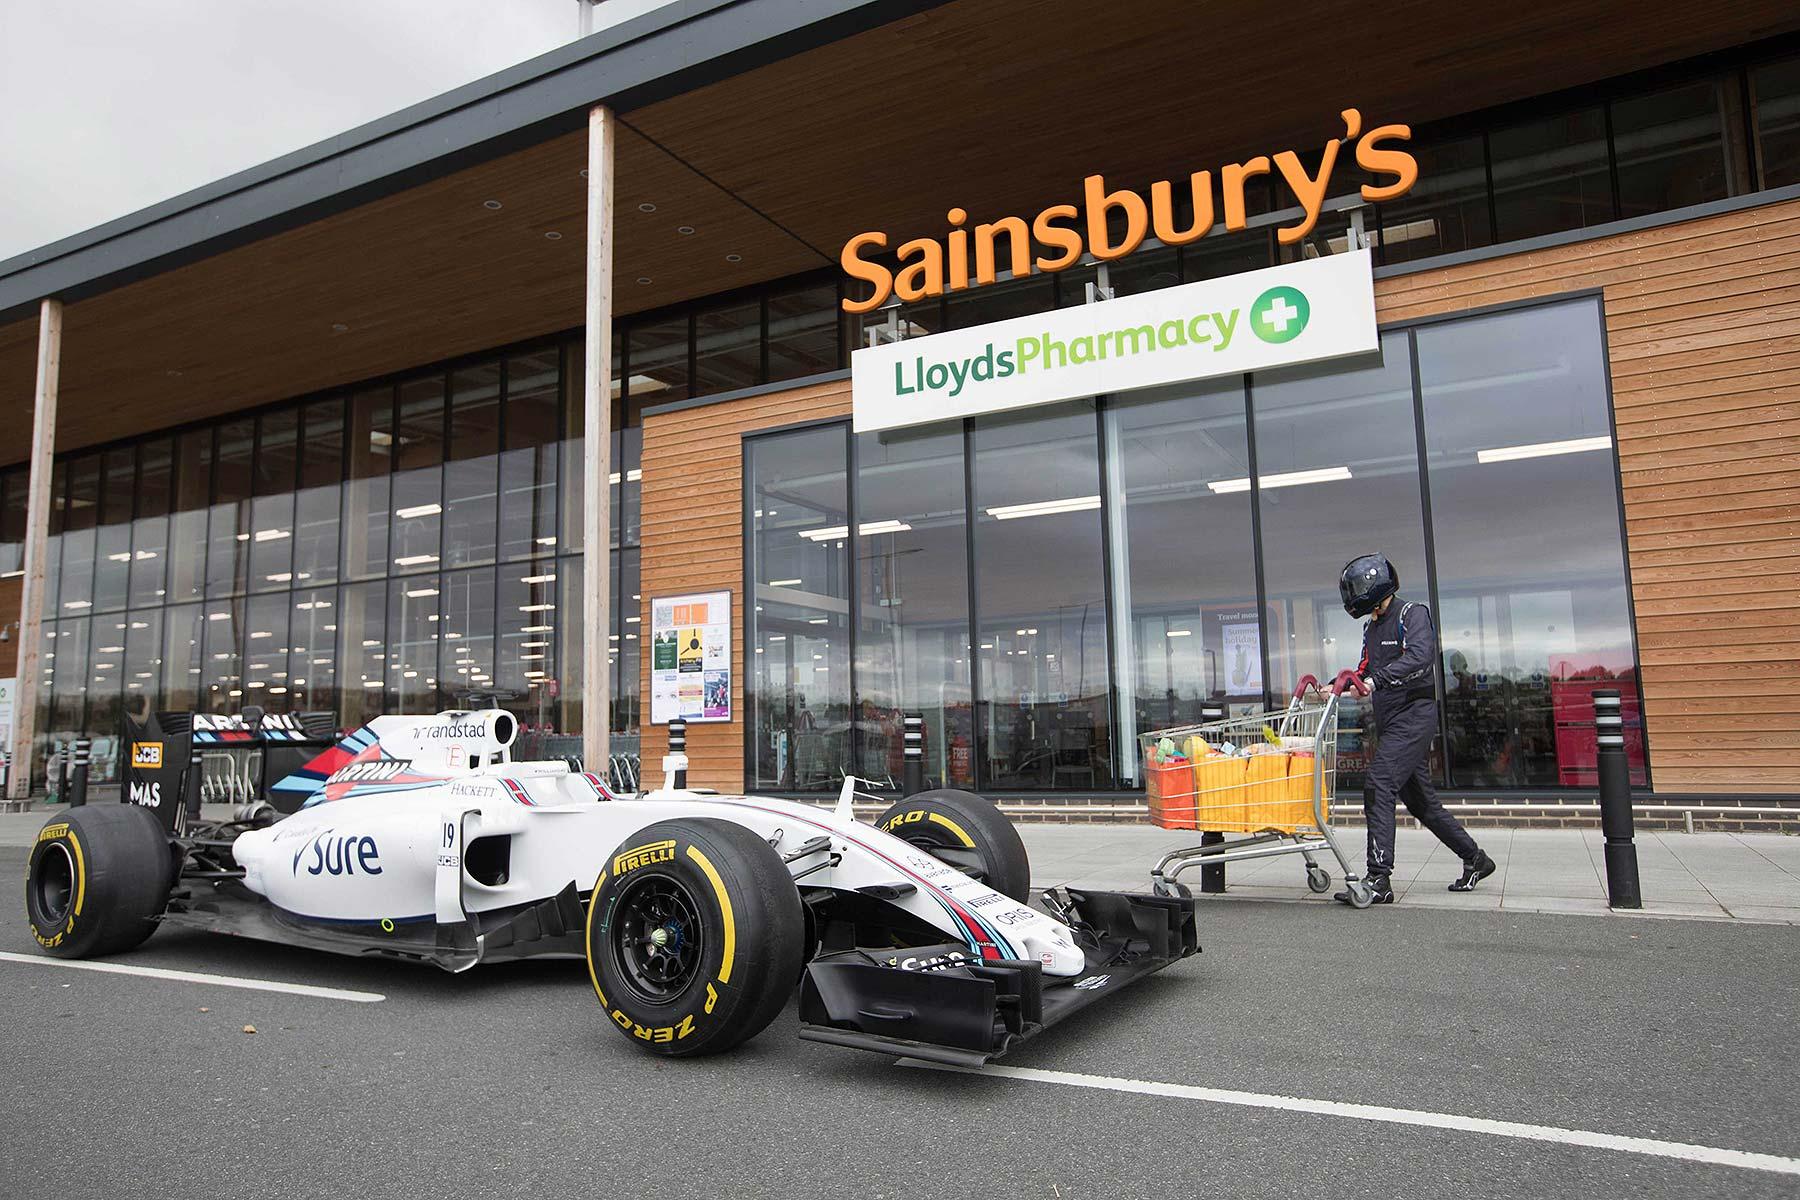 Williams F1 and Sainsbury's